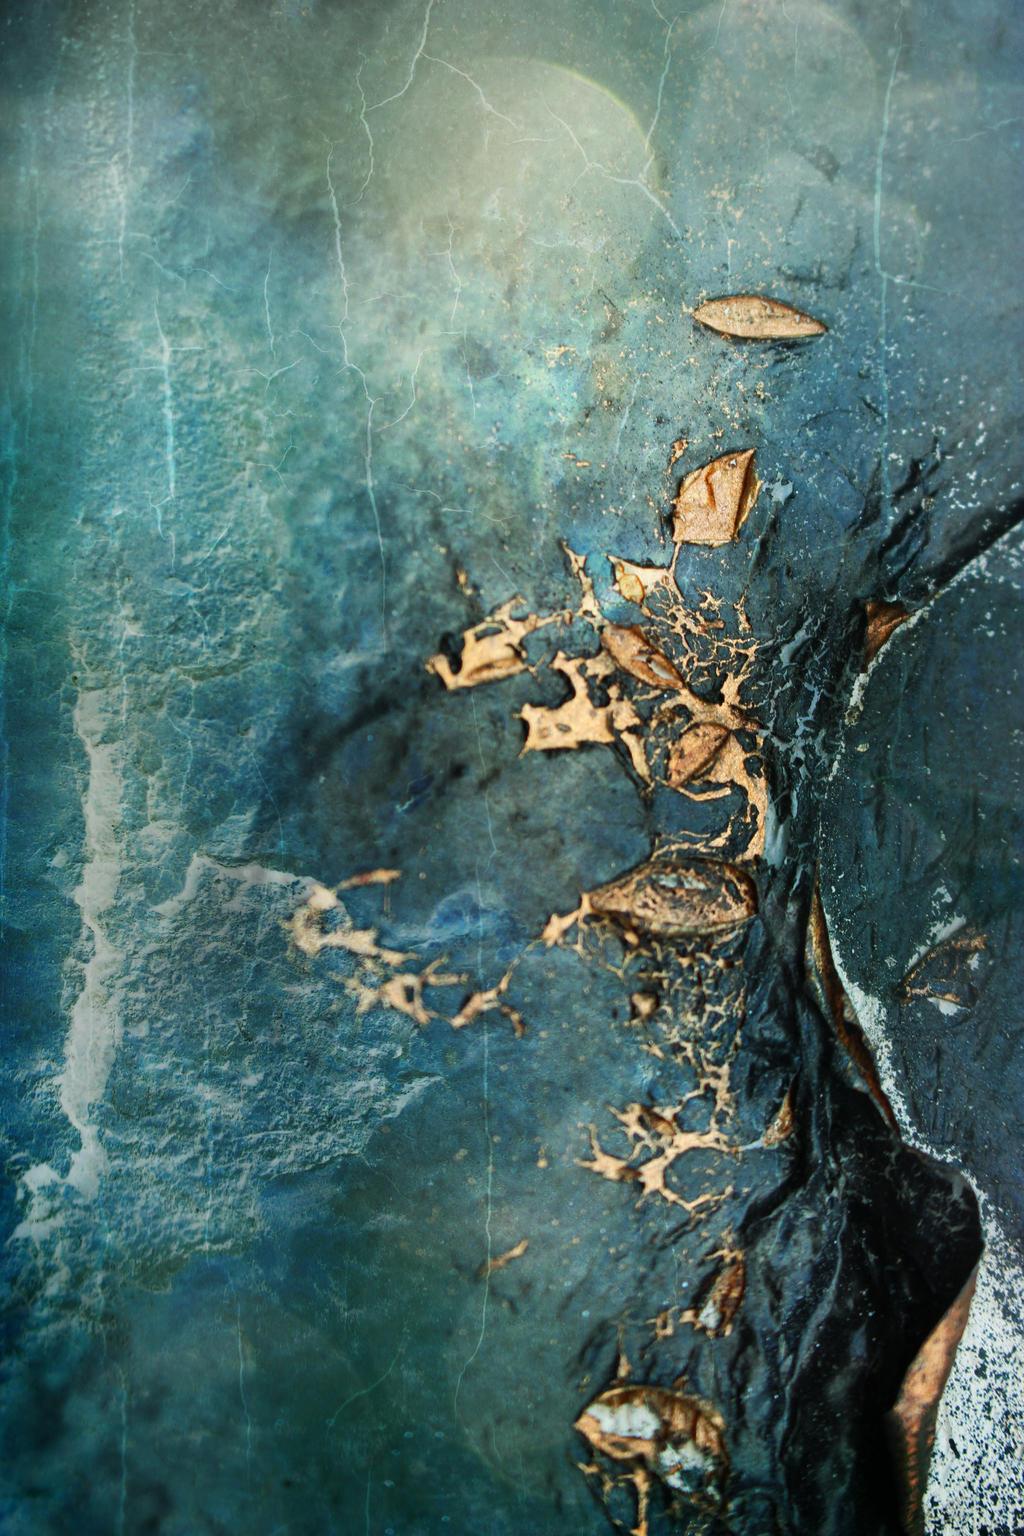 Digital Art Texture 217 by mercurycode